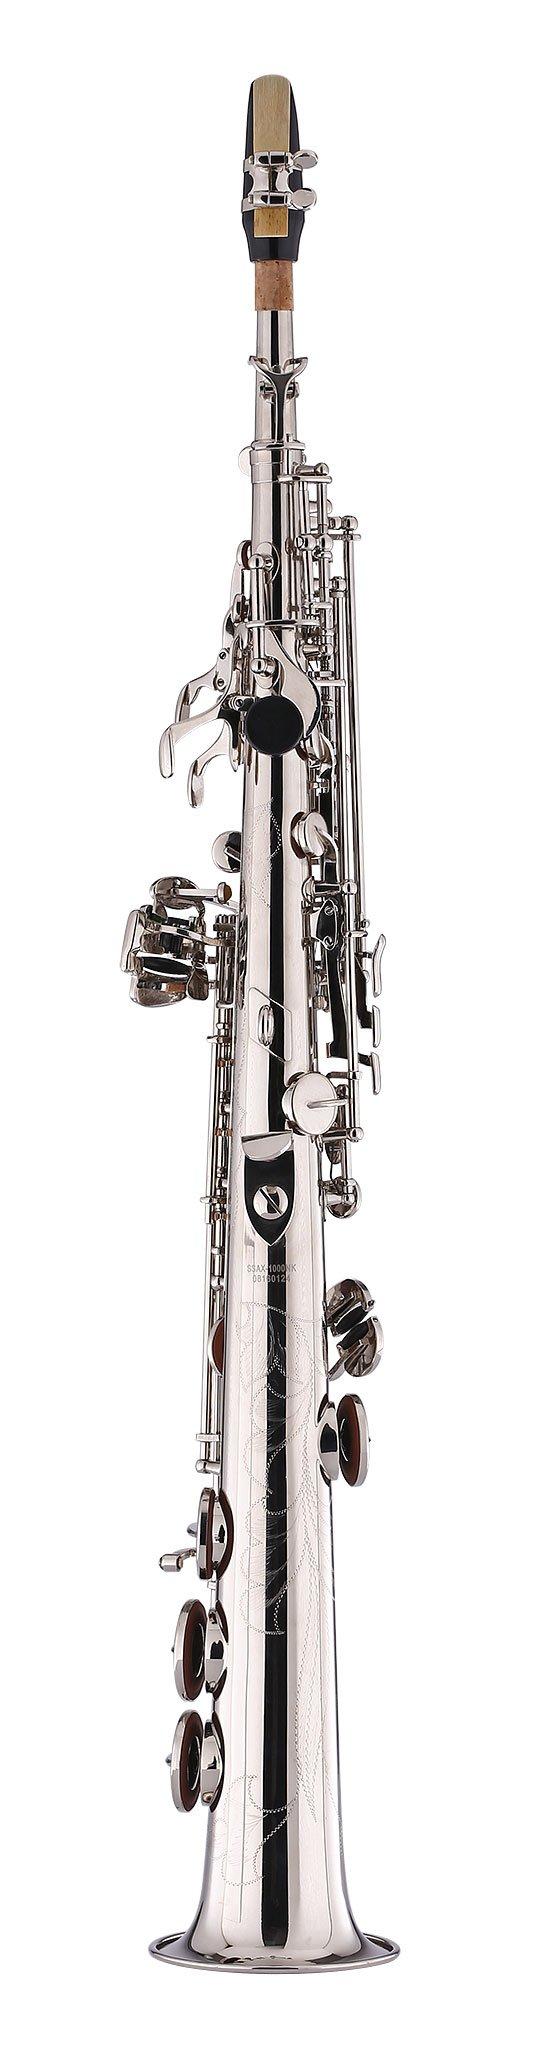 Kaizer Soprano Saxophone Straight B Flat Bb Nickel Silver SSAX-1000NK by Kaizer (Image #2)